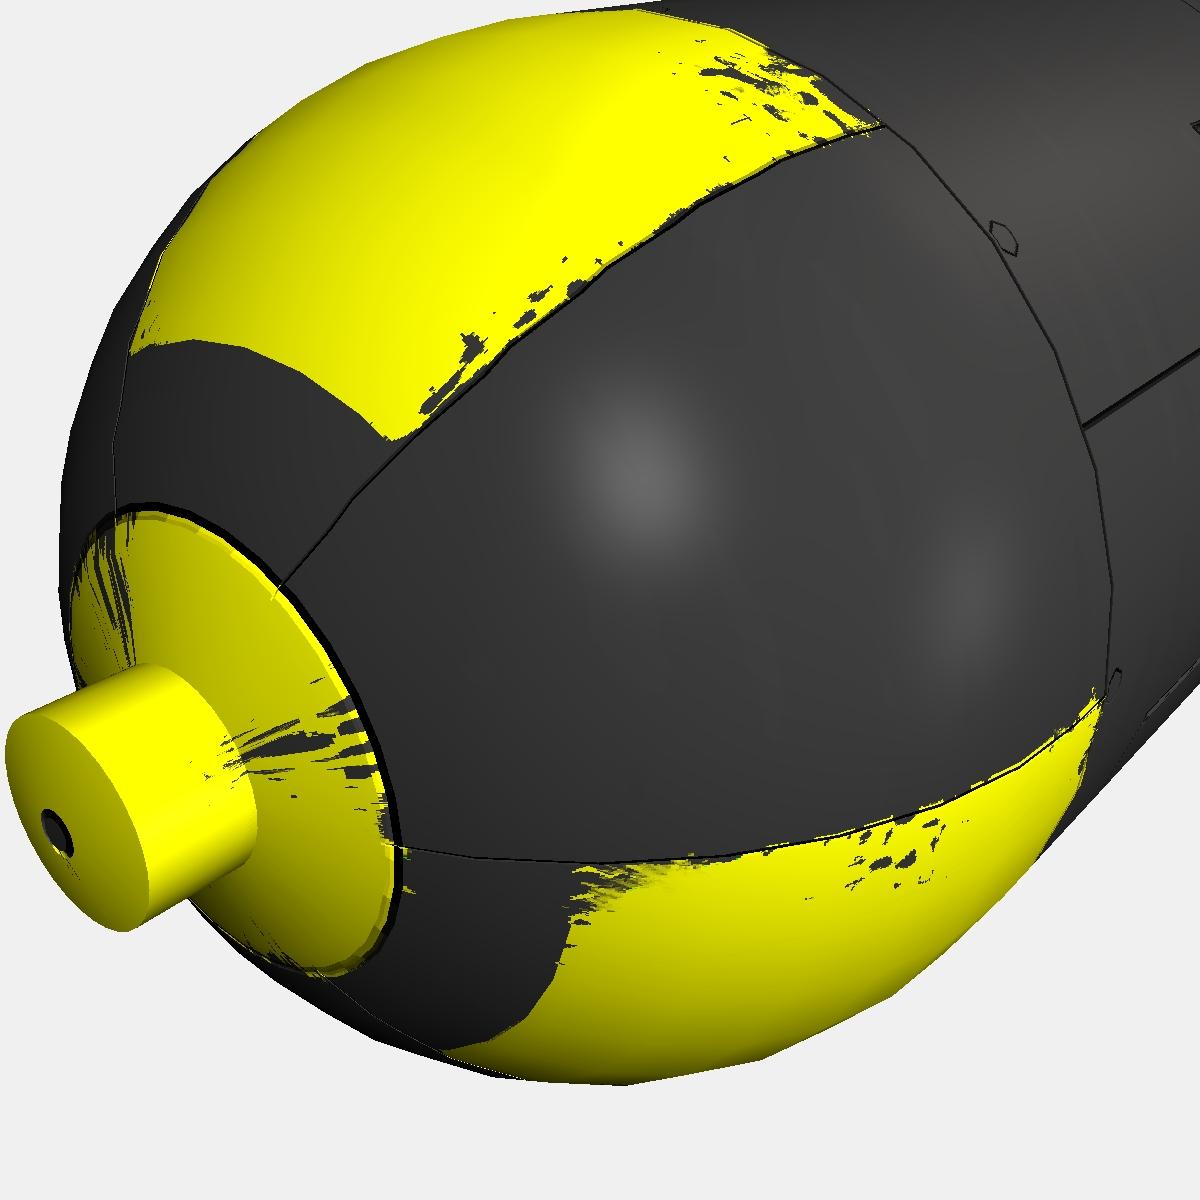 Nuclear schemed bomb 3d model 3ds dxf fbx blend cob dae X obj 162655